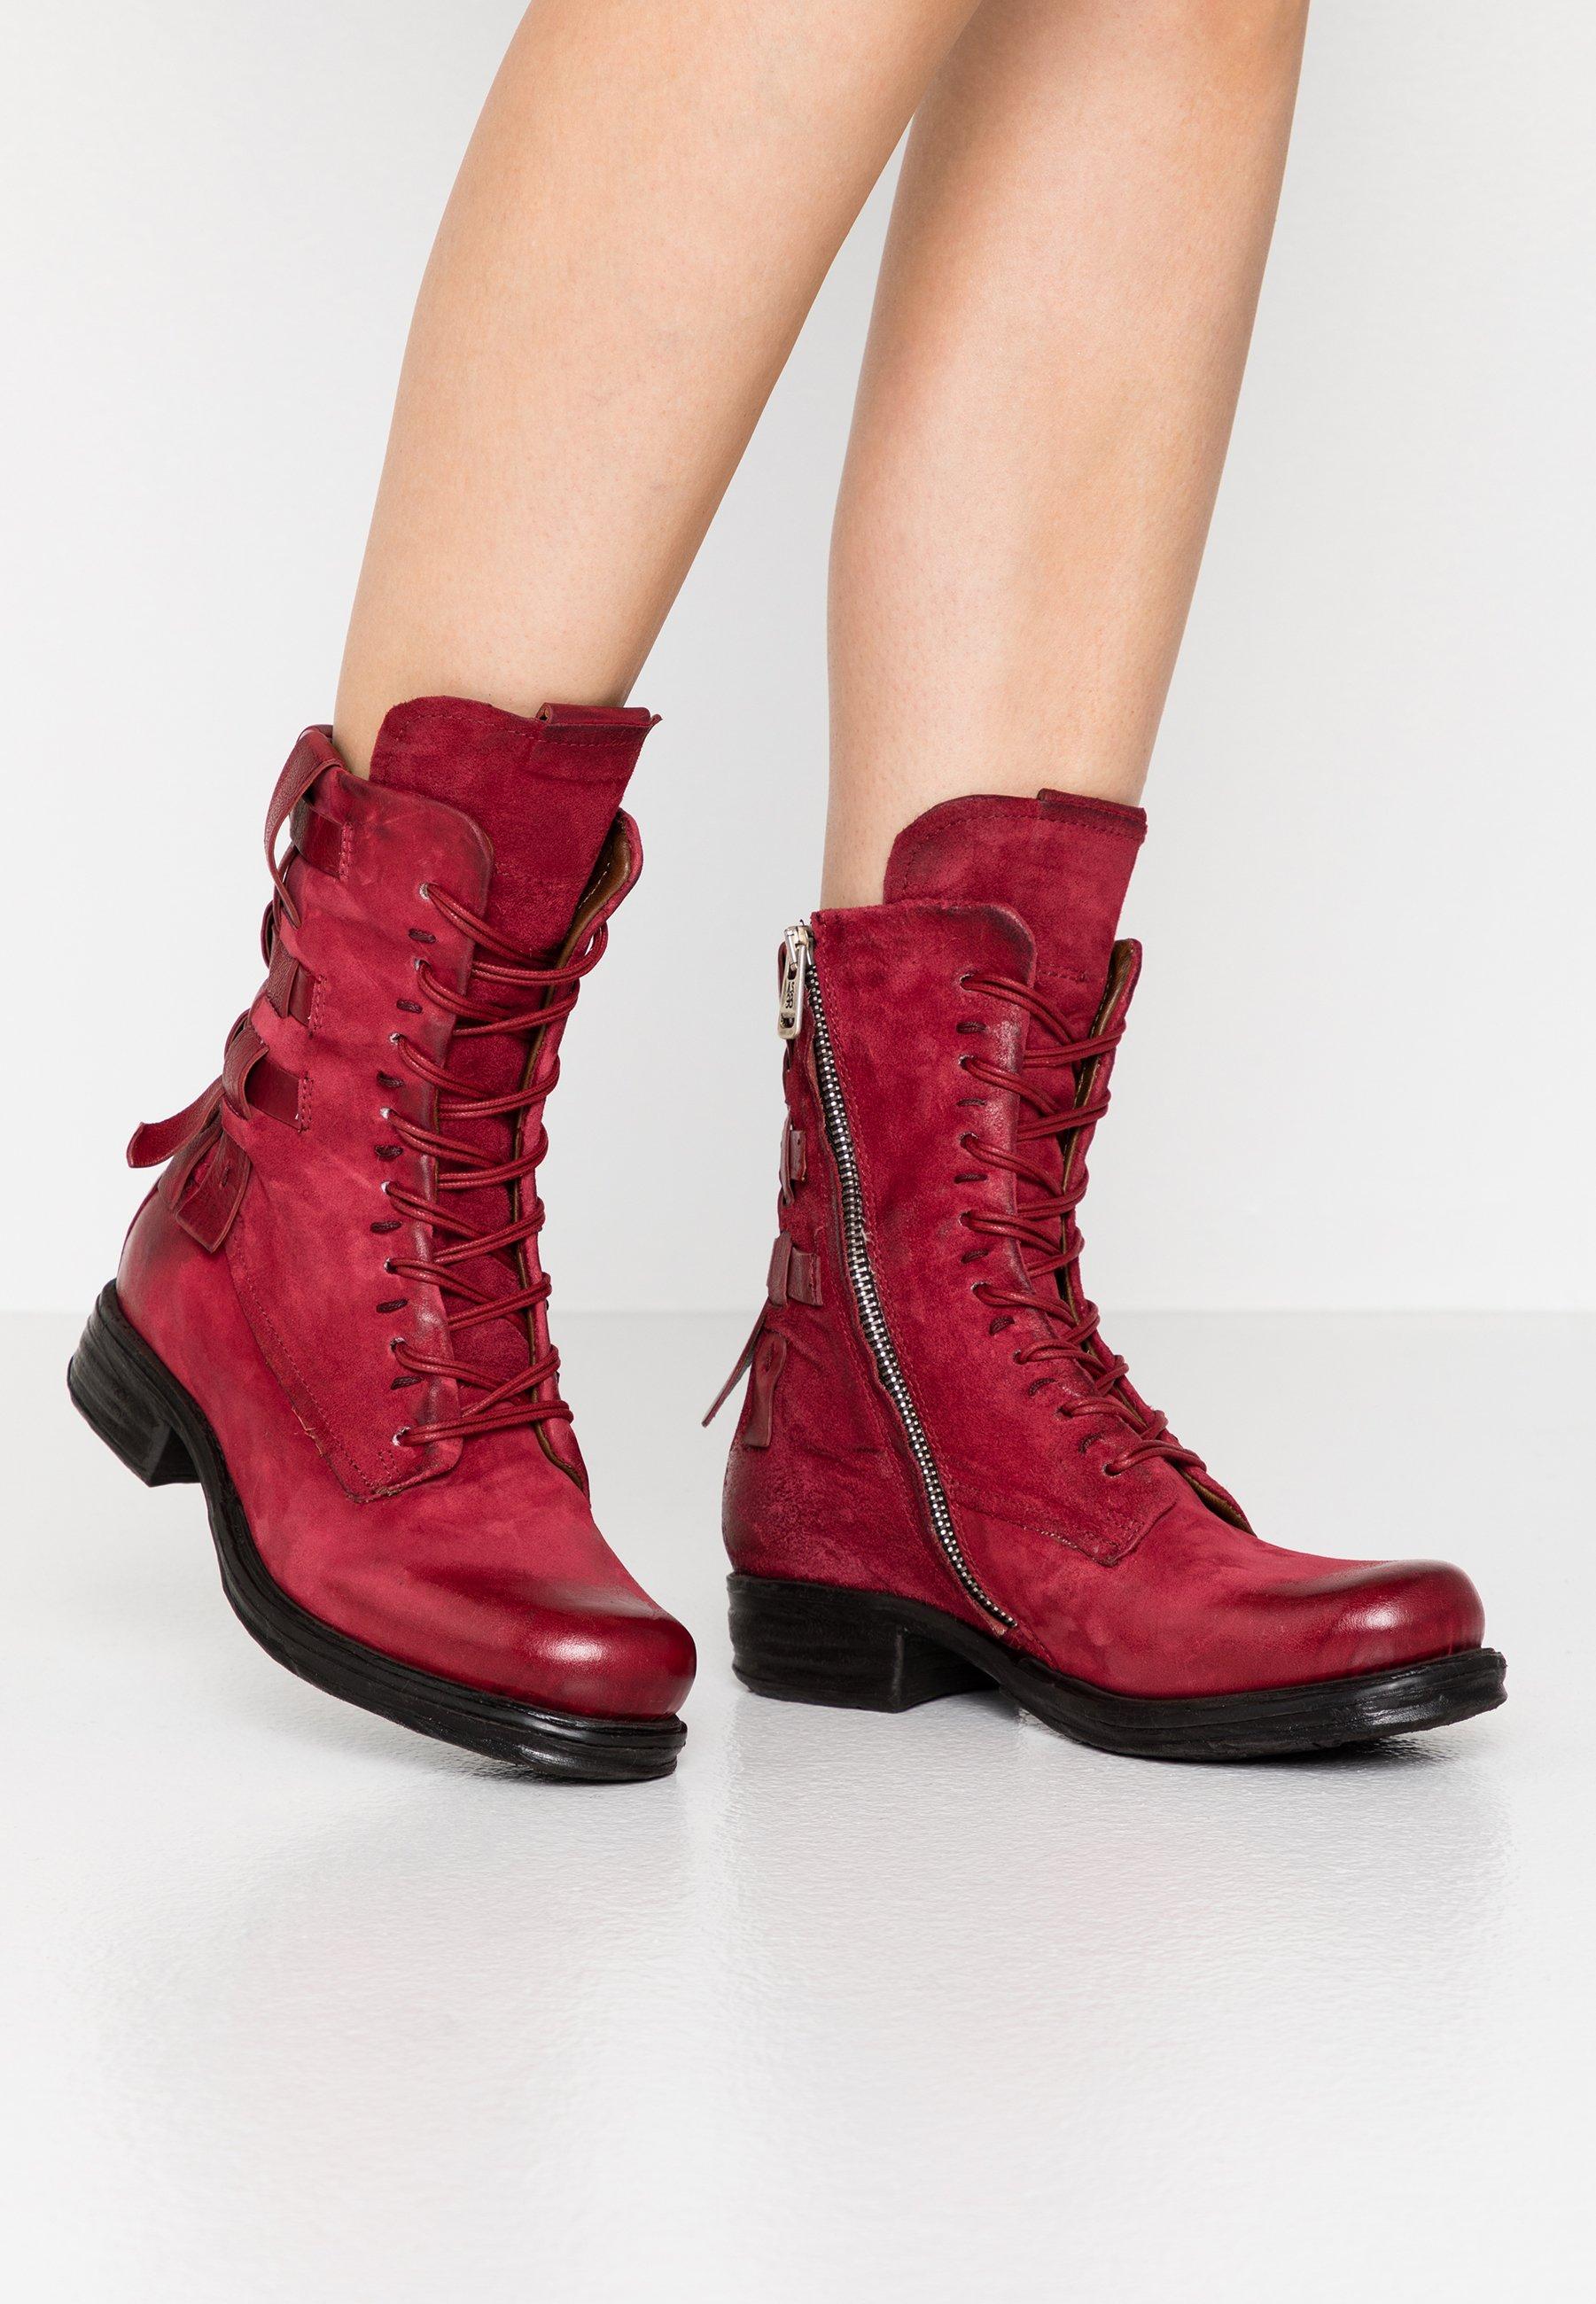 A.s.98 Cowboy/biker Ankle Boot - Cardinal